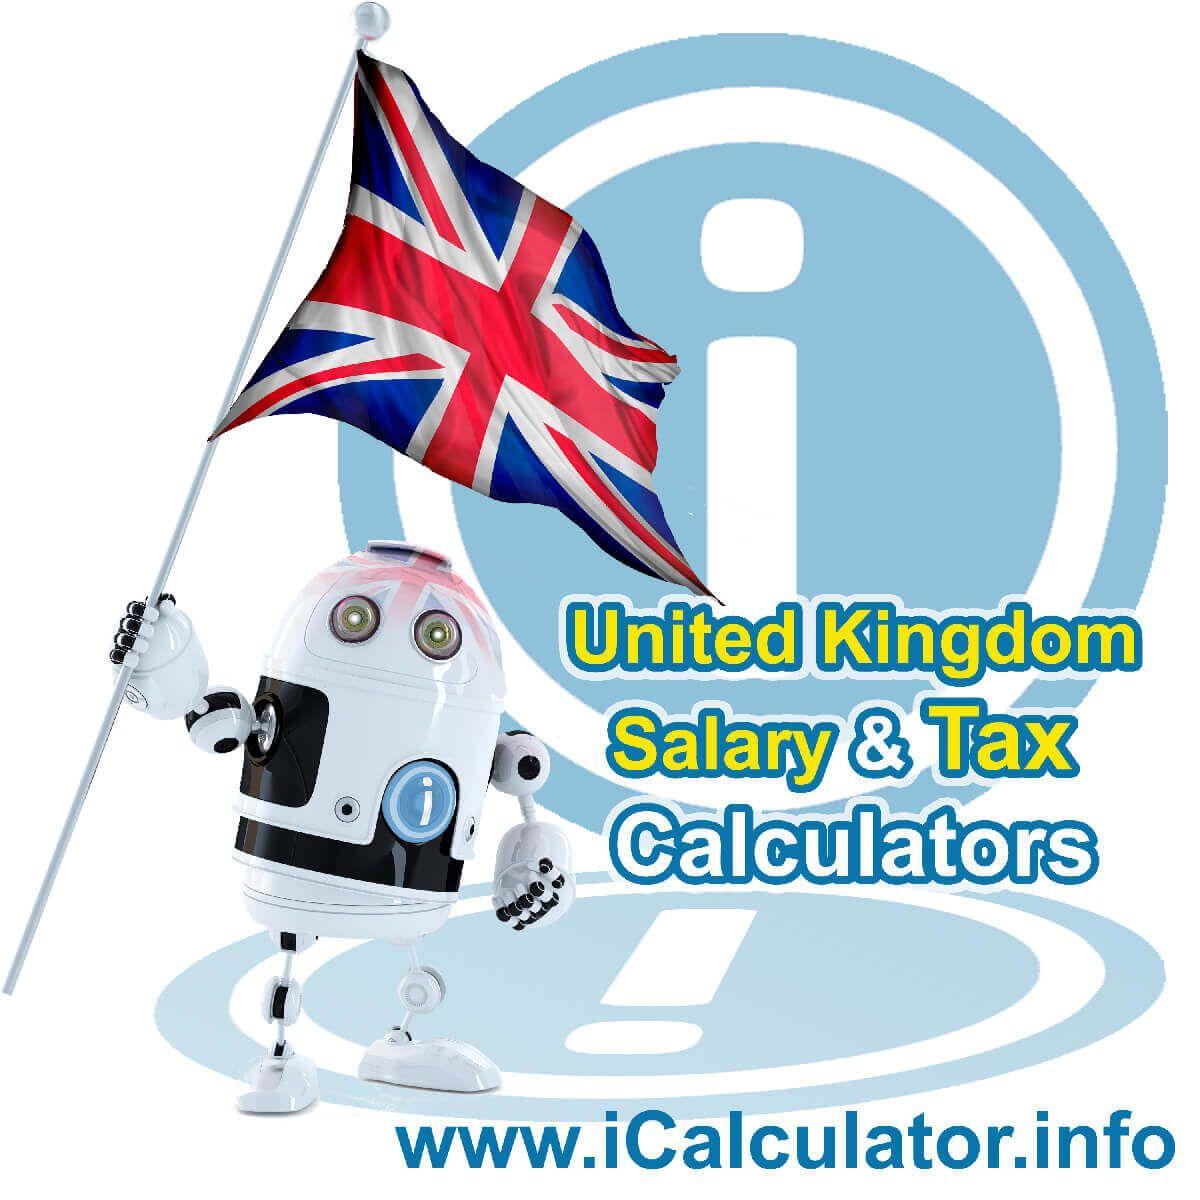 2019/20 Tax Calculator for salayr, payroll and wage slip